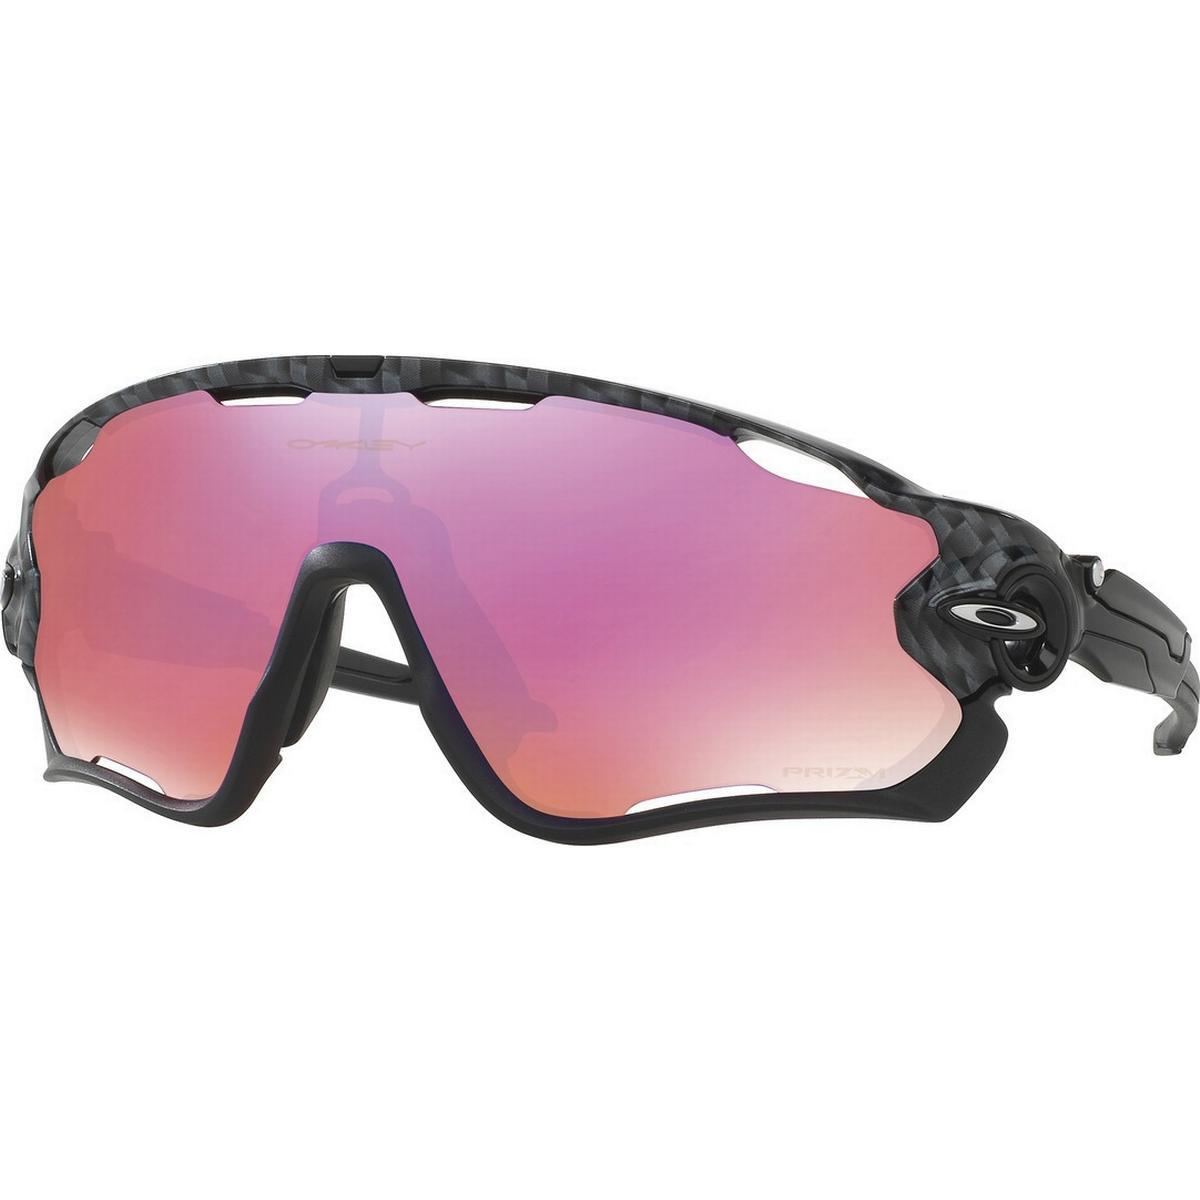 d25b5eefae6f Oakley Solbriller - Sammenlign priser hos PriceRunner